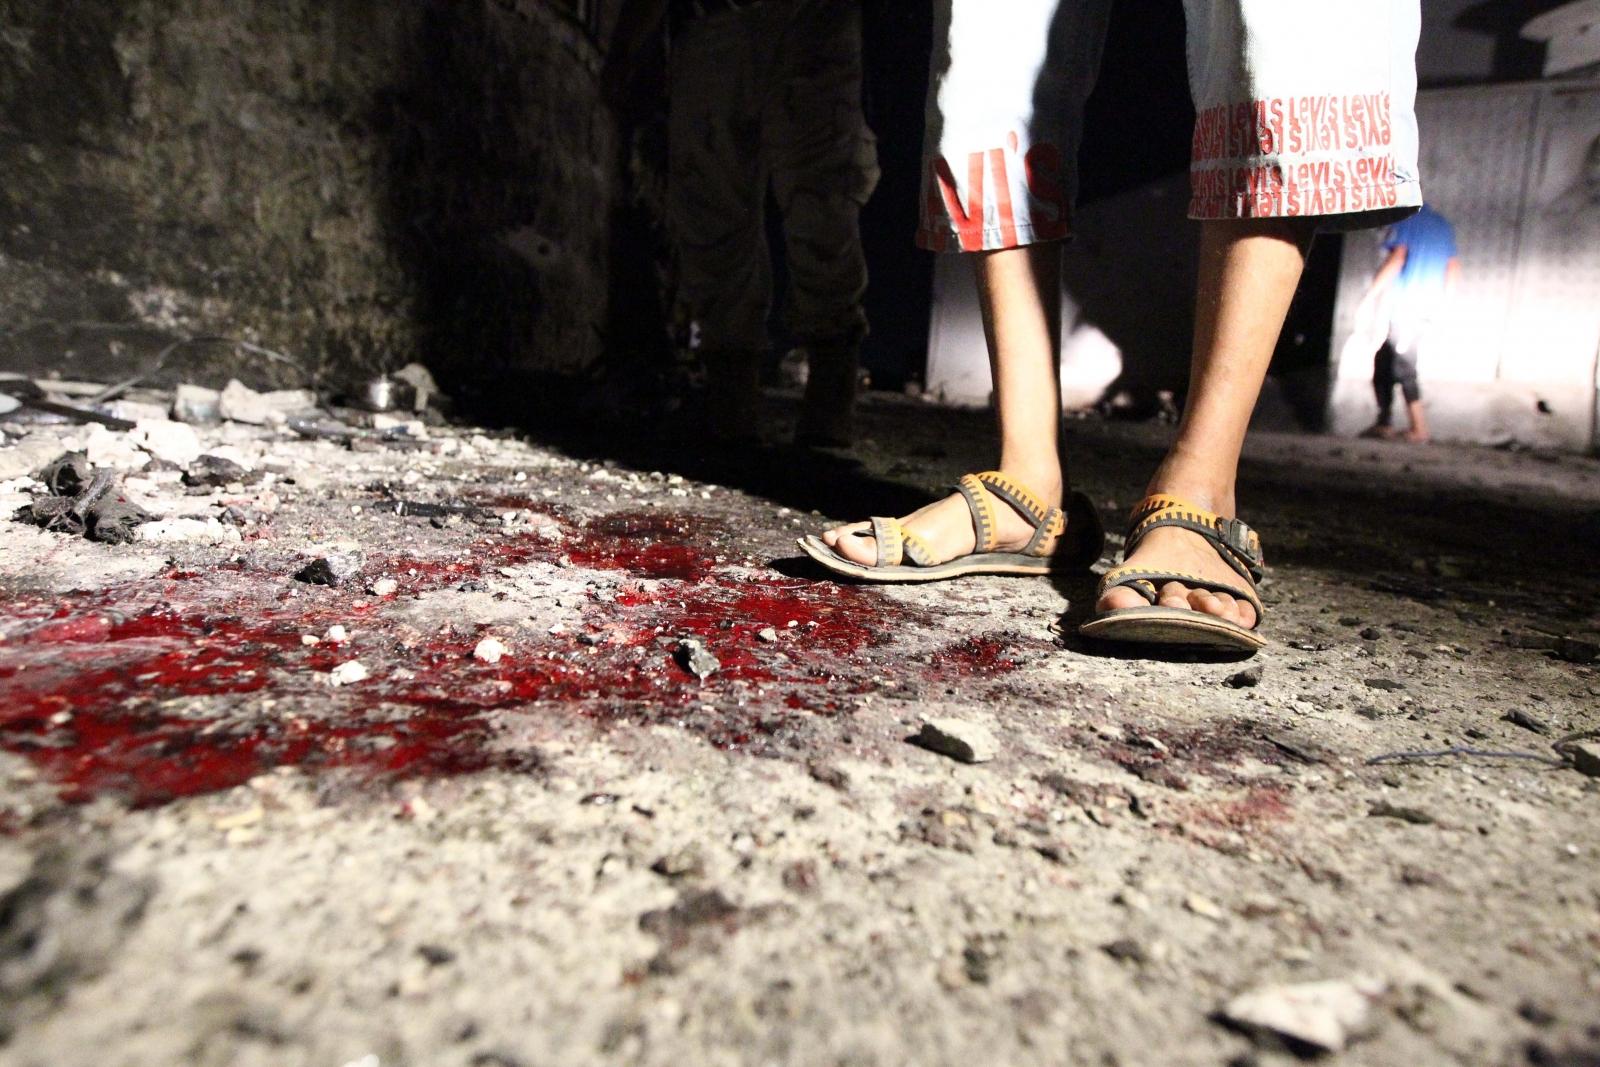 Benghazi blood